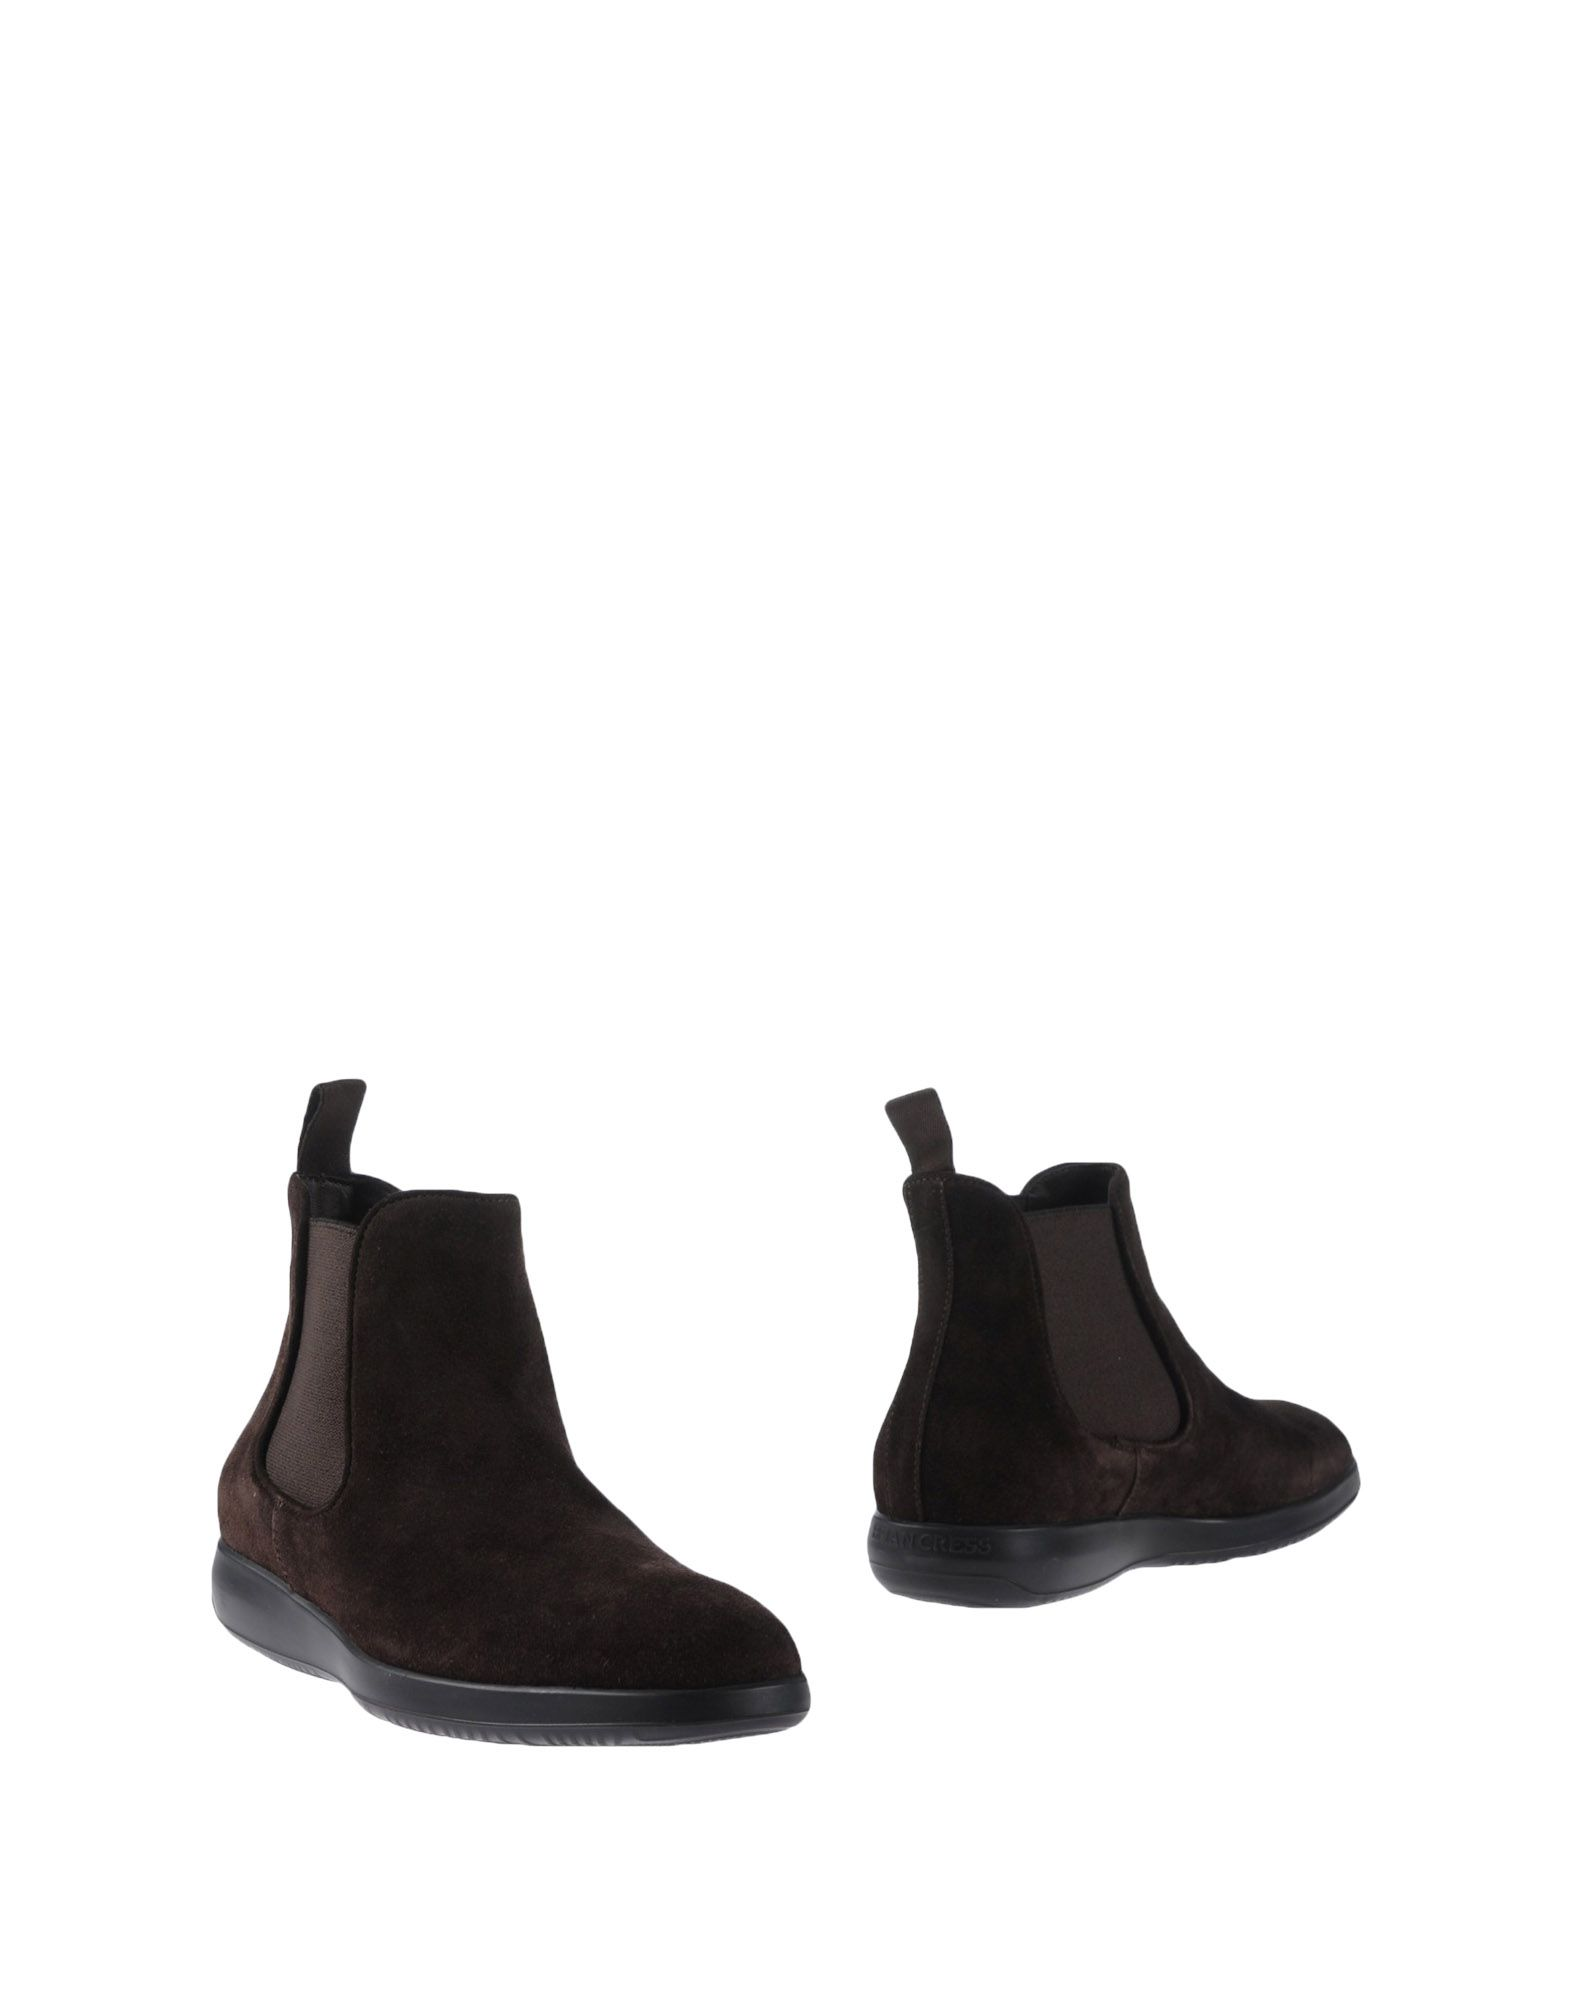 BRIAN CRESS Полусапоги и высокие ботинки brian atwood полусапоги и высокие ботинки